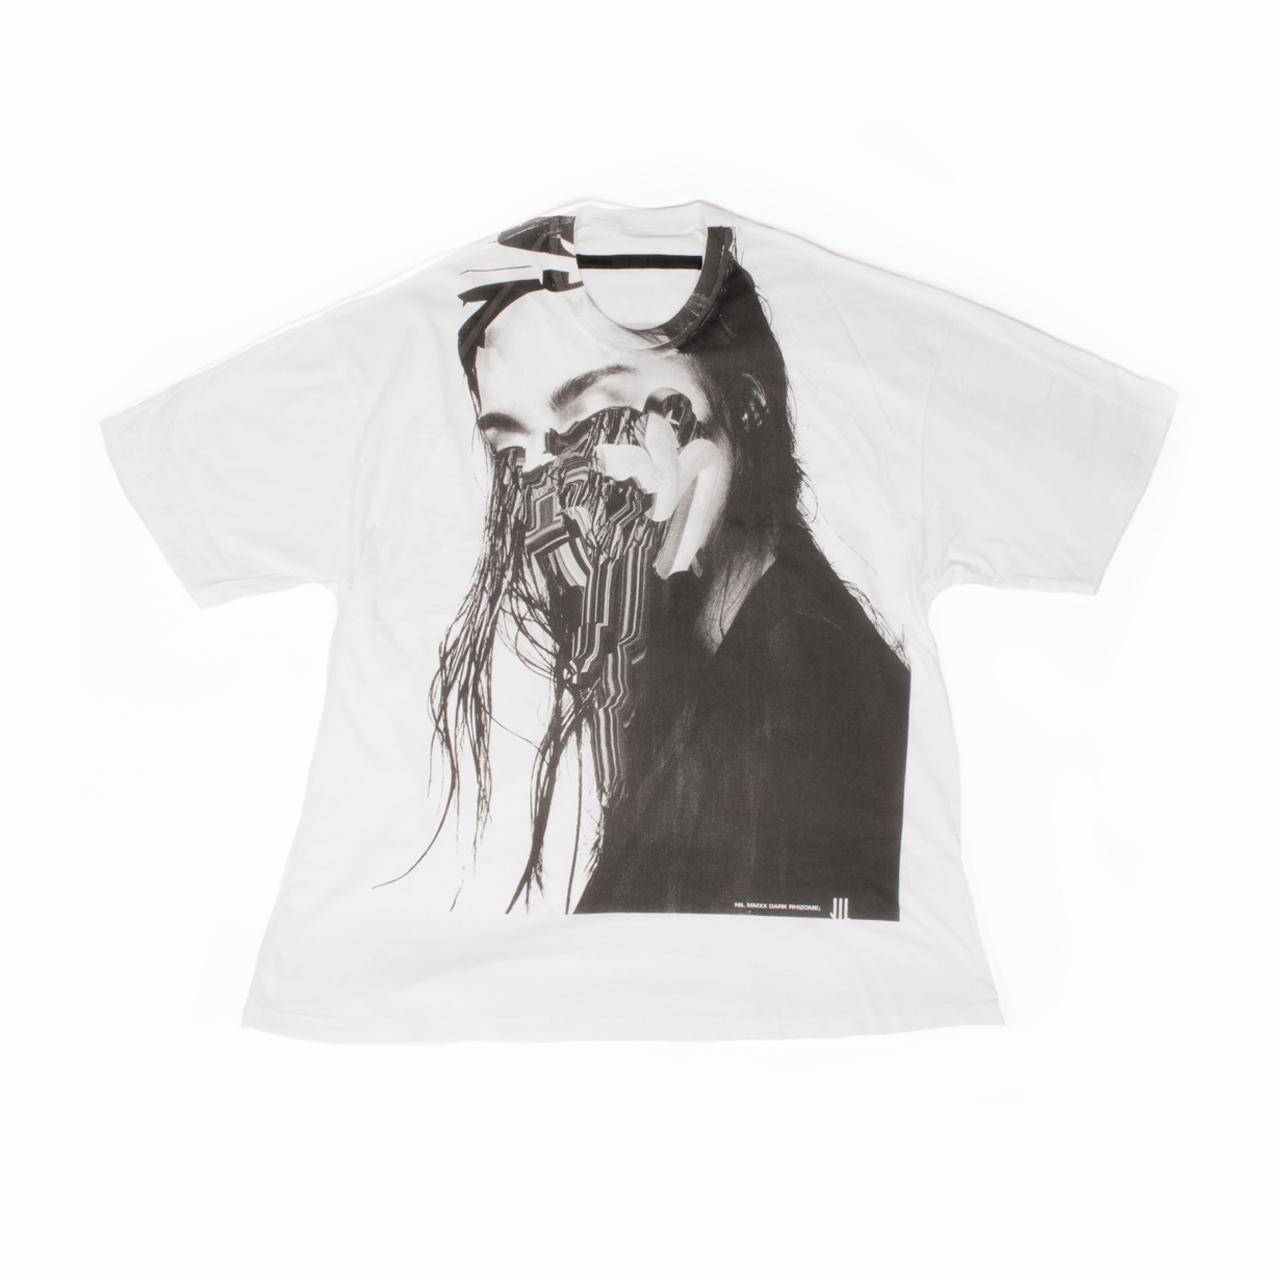 701CPM12-OFF / Jesse Draxler プリント Tシャツ ver.2